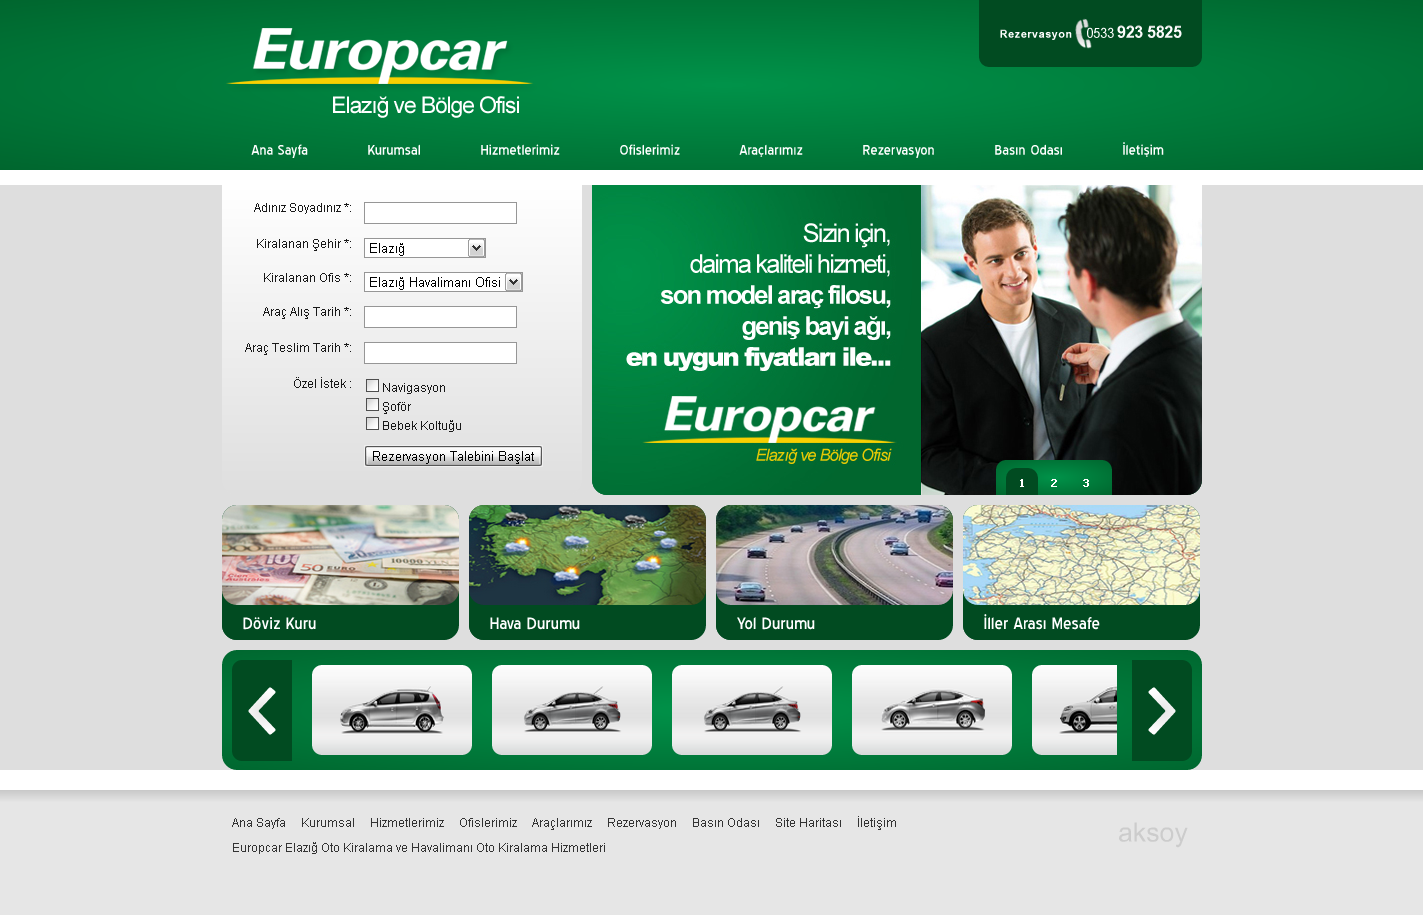 Europcar Elazig ve Bolge Ofisi by fahrettinaksoy